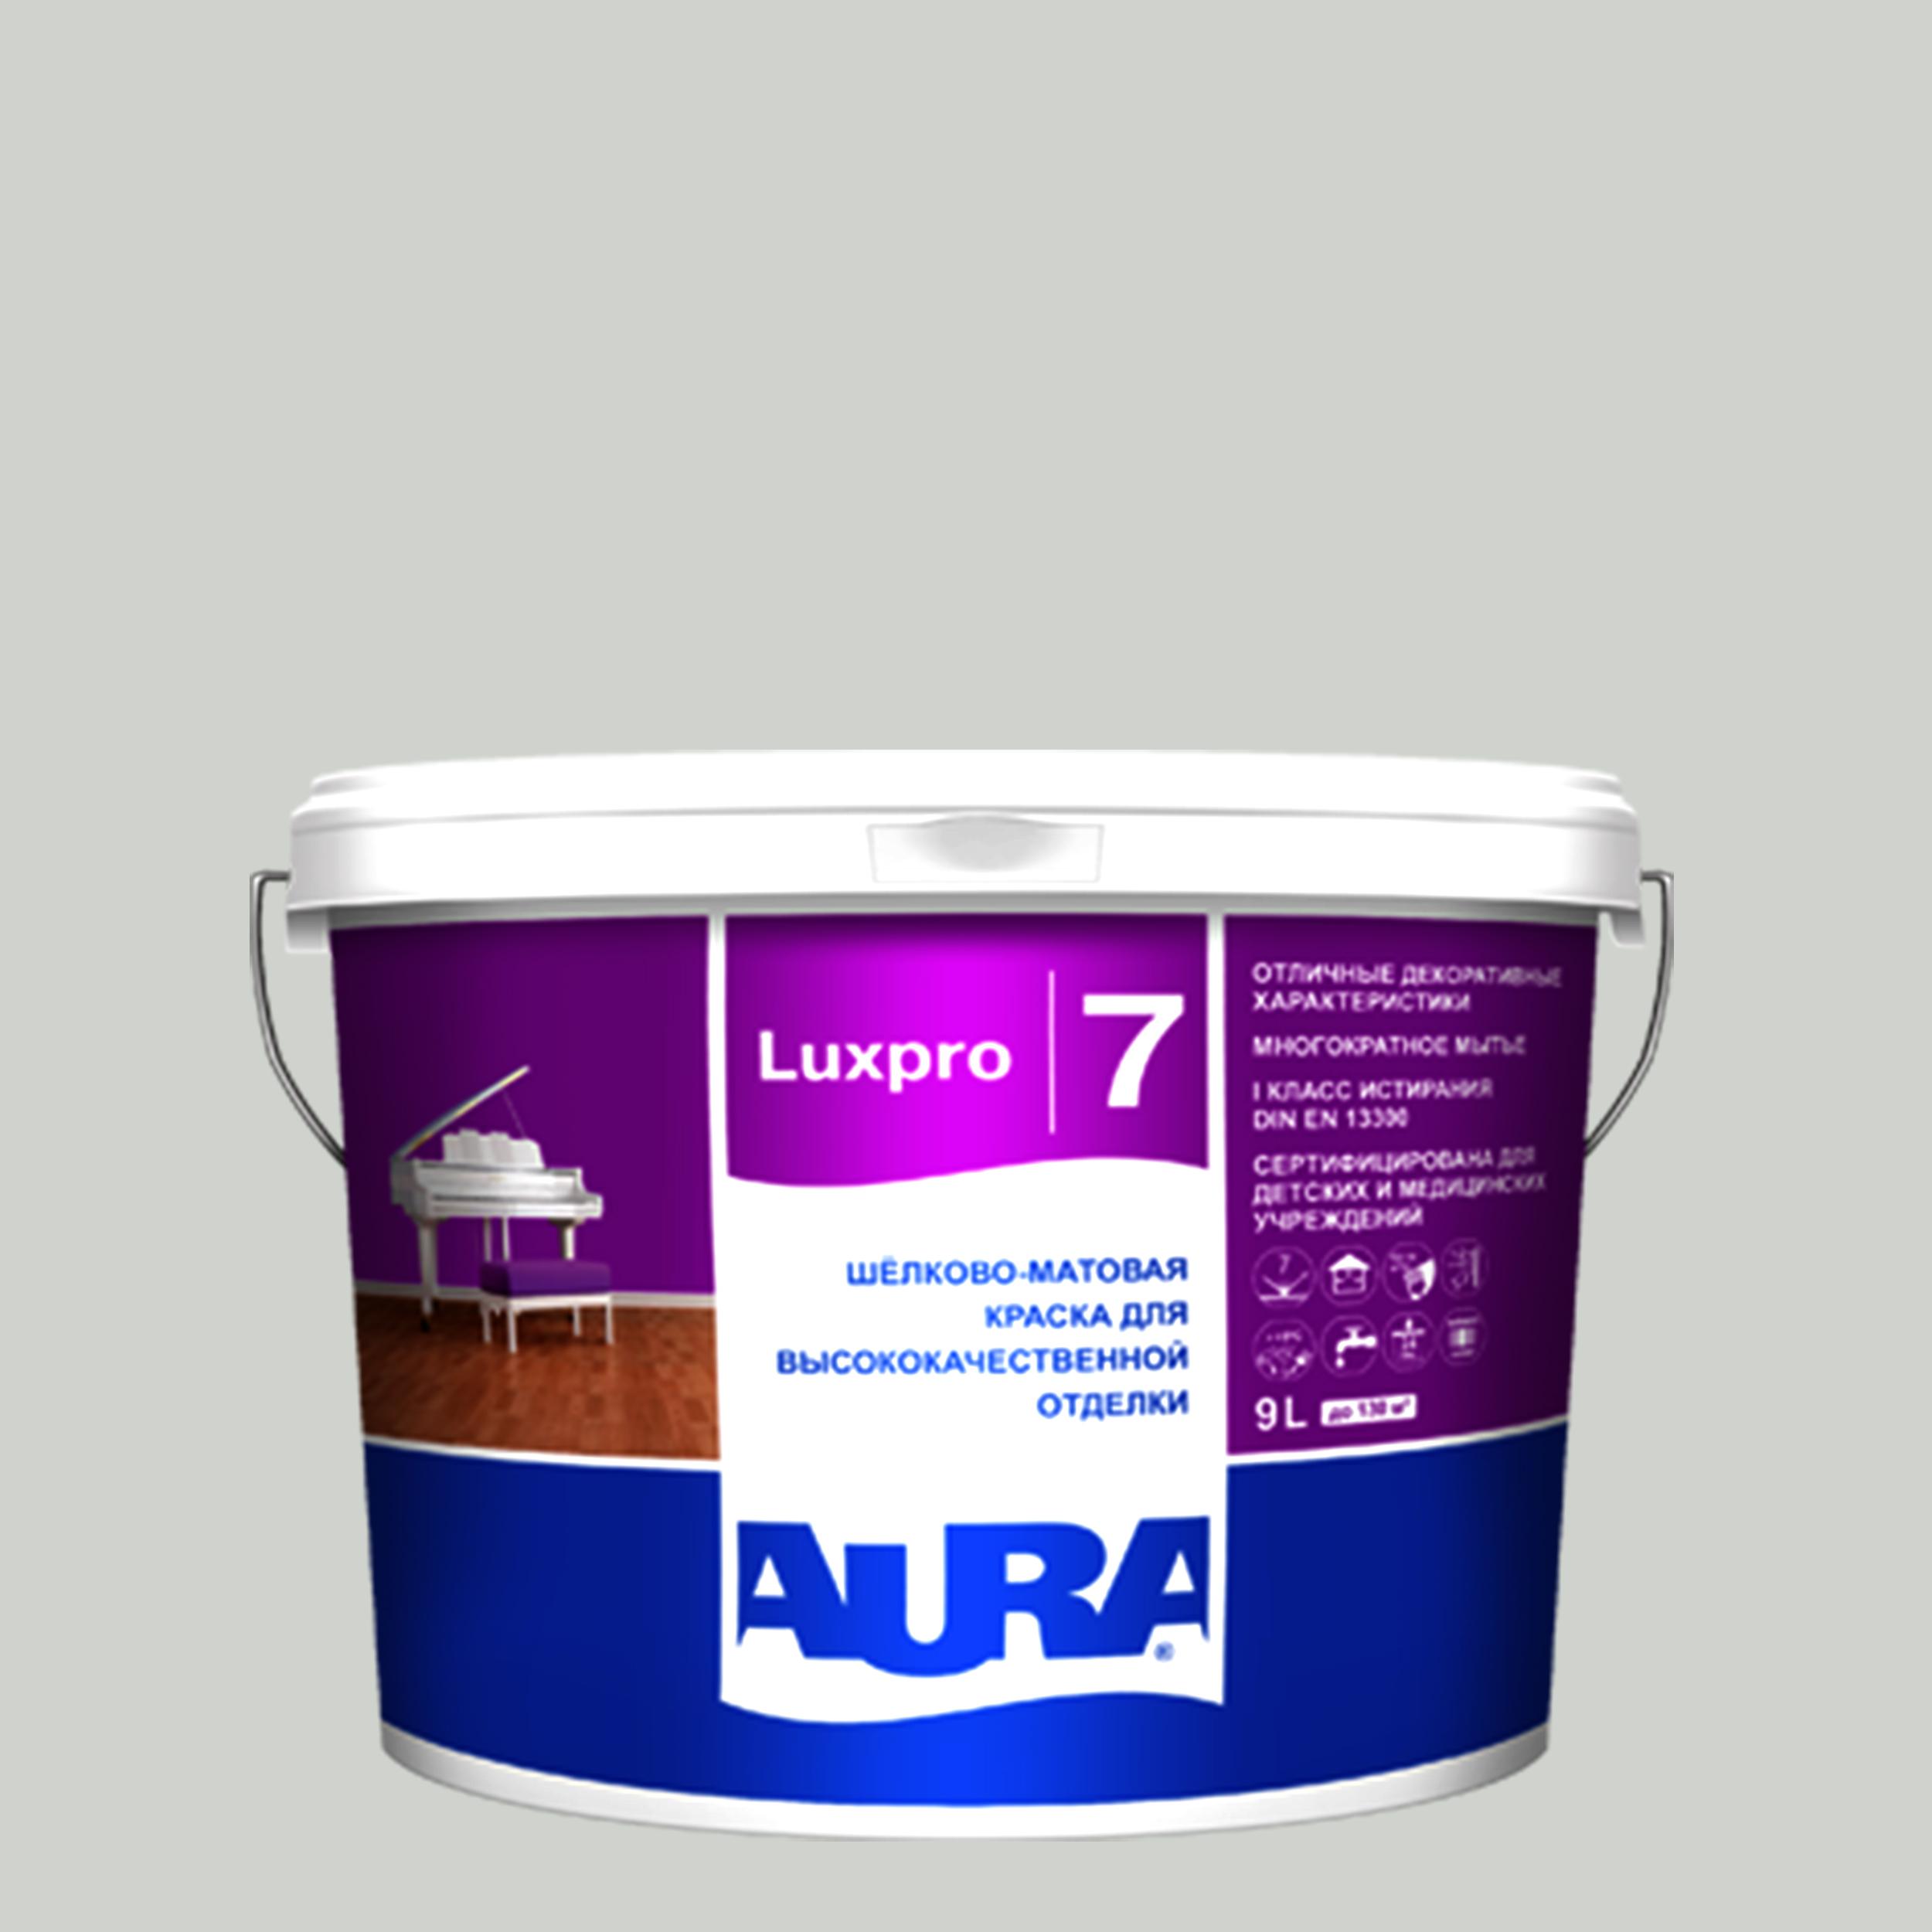 Фото 5 - Краска интерьерная, Aura LuxPRO 7, RAL 9001, 11 кг.